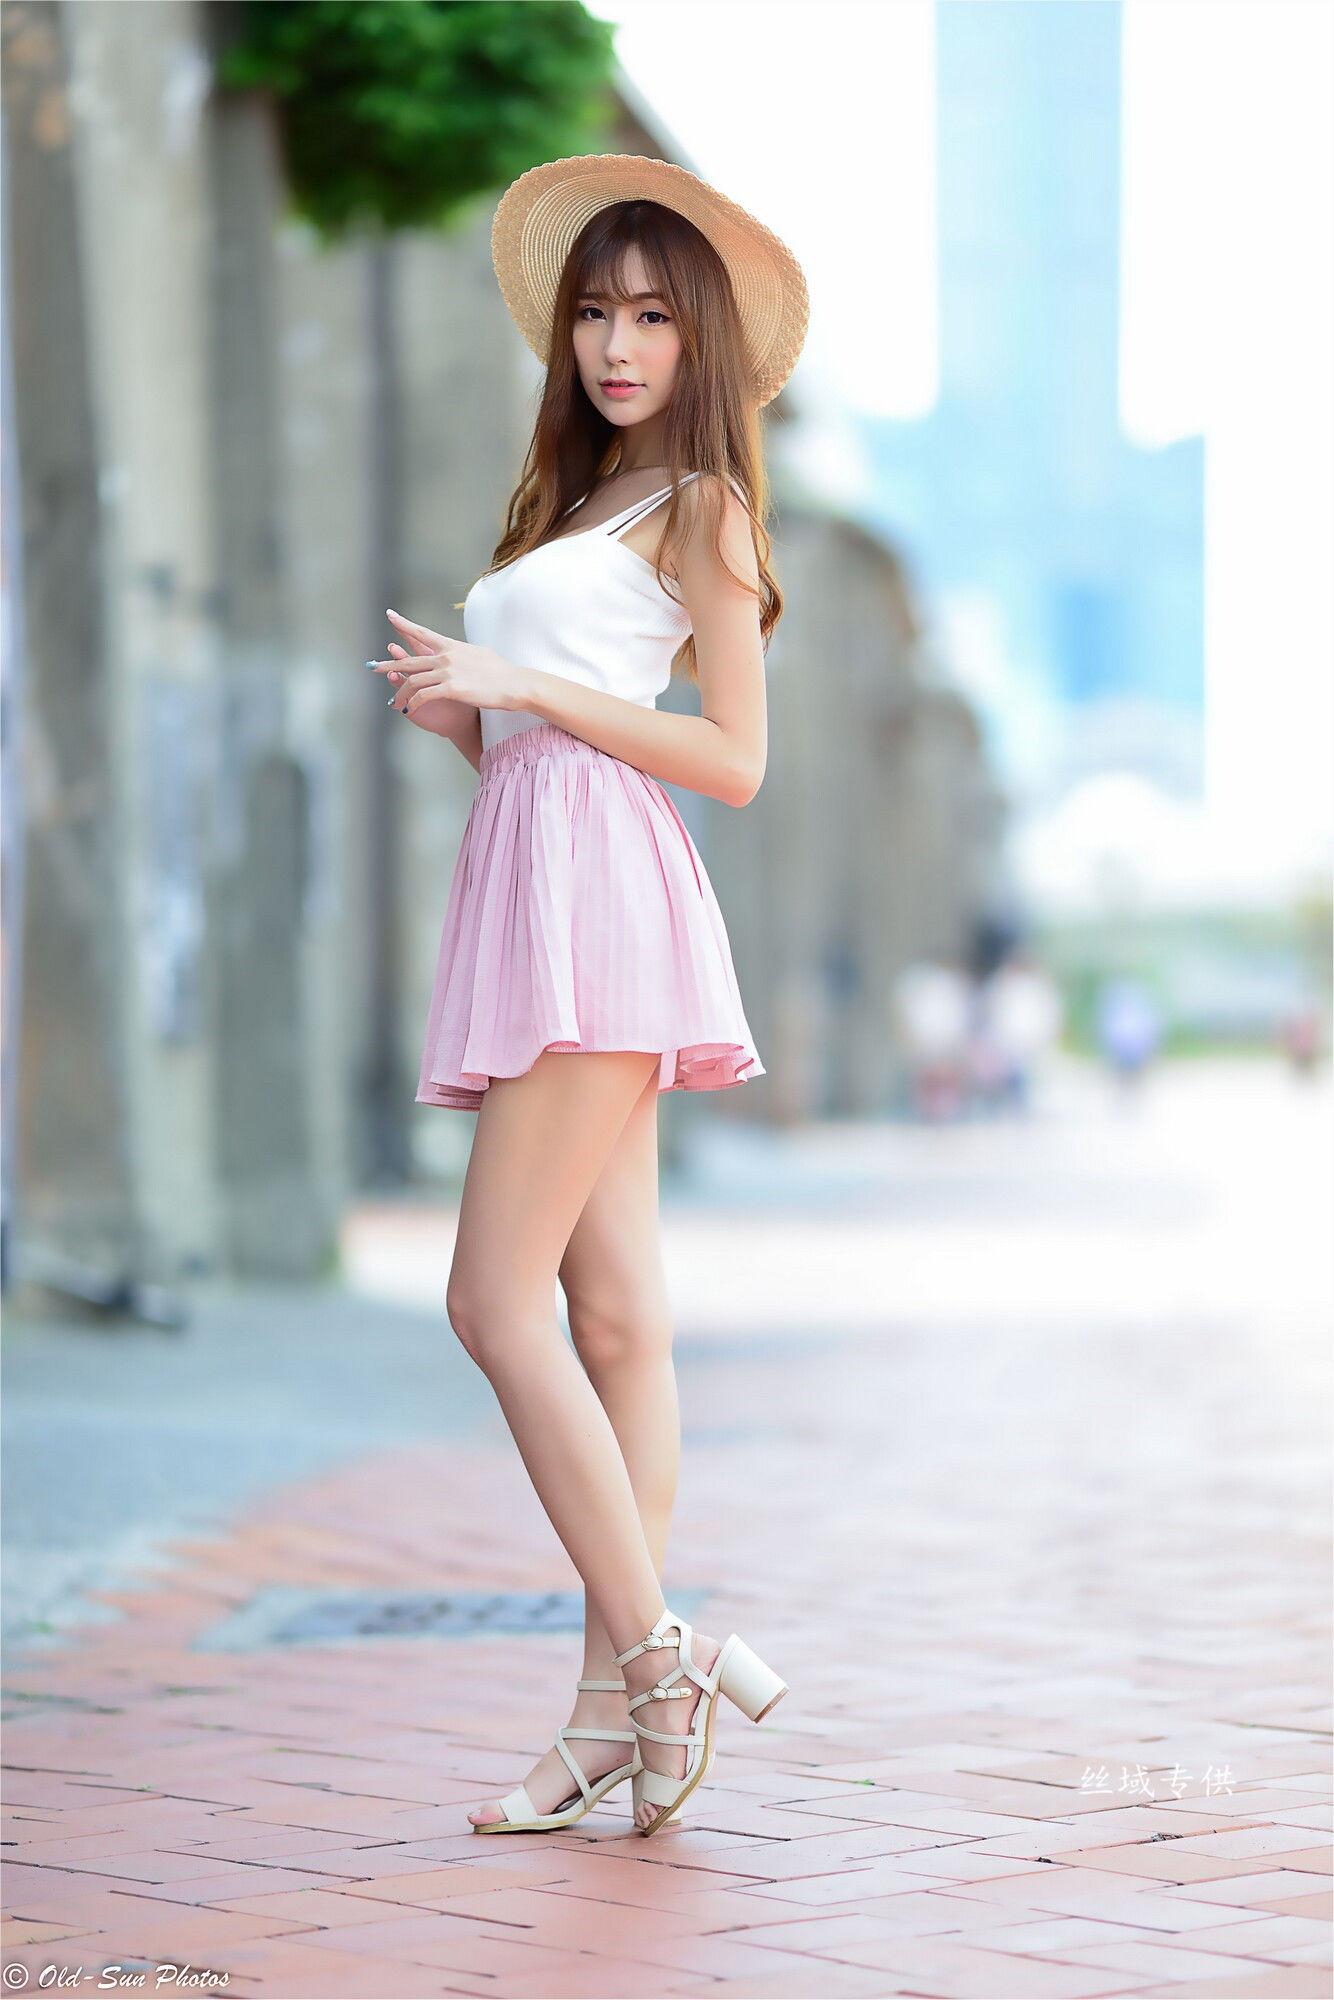 VOL.1908 [台湾正妹]甜美女神街拍连衣裙:黄上晏(黄上晏Rubis)超高清个人性感漂亮大图(99P)